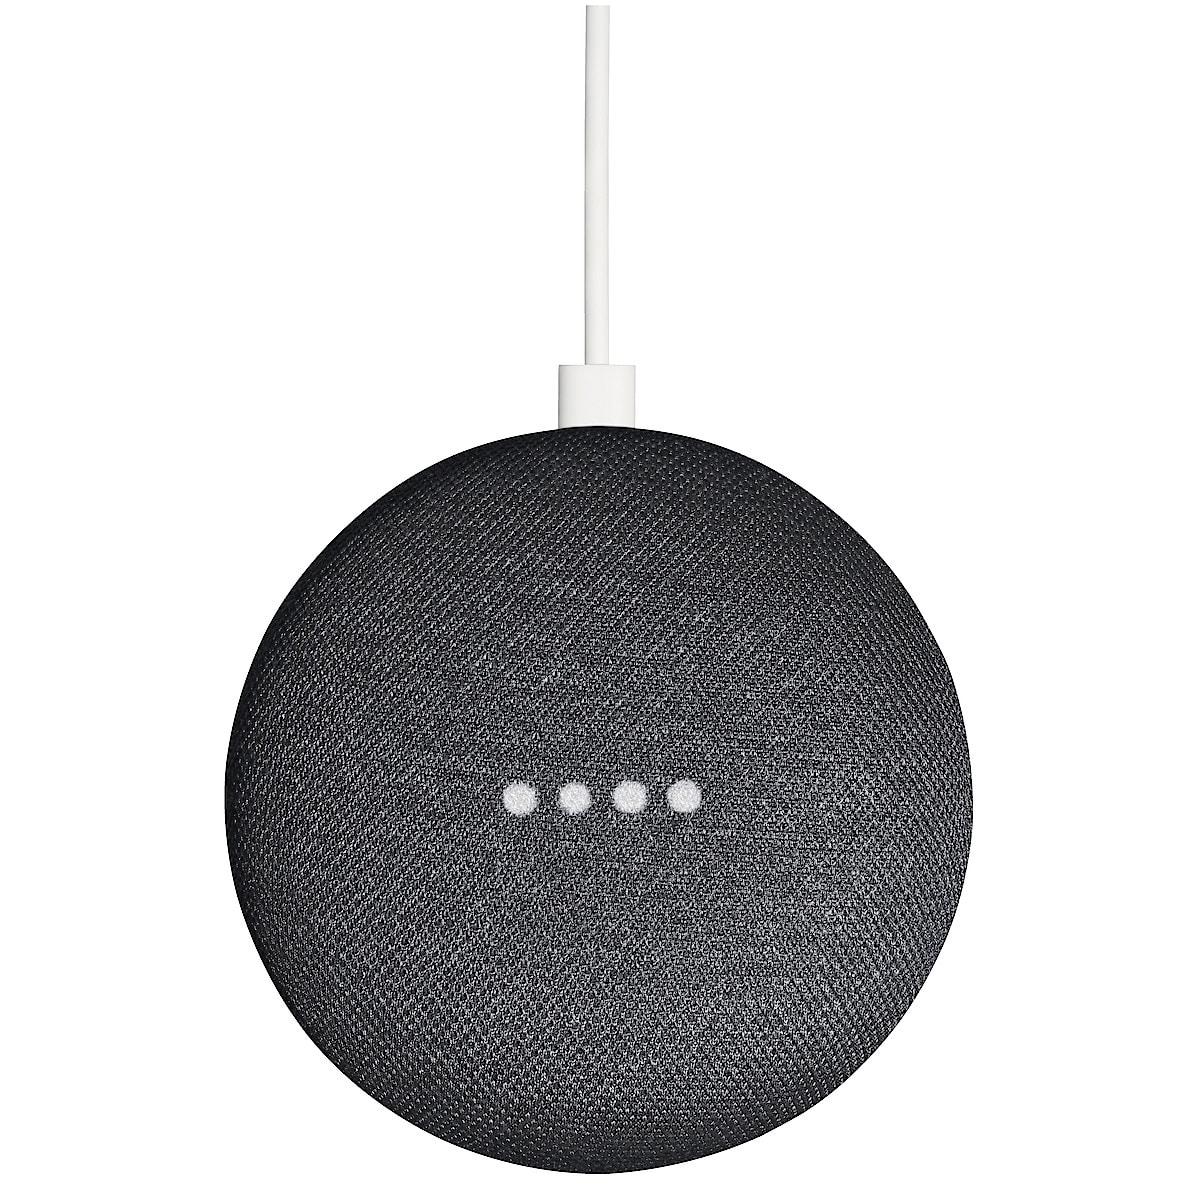 Röstassistent Google Home Mini, svensk version